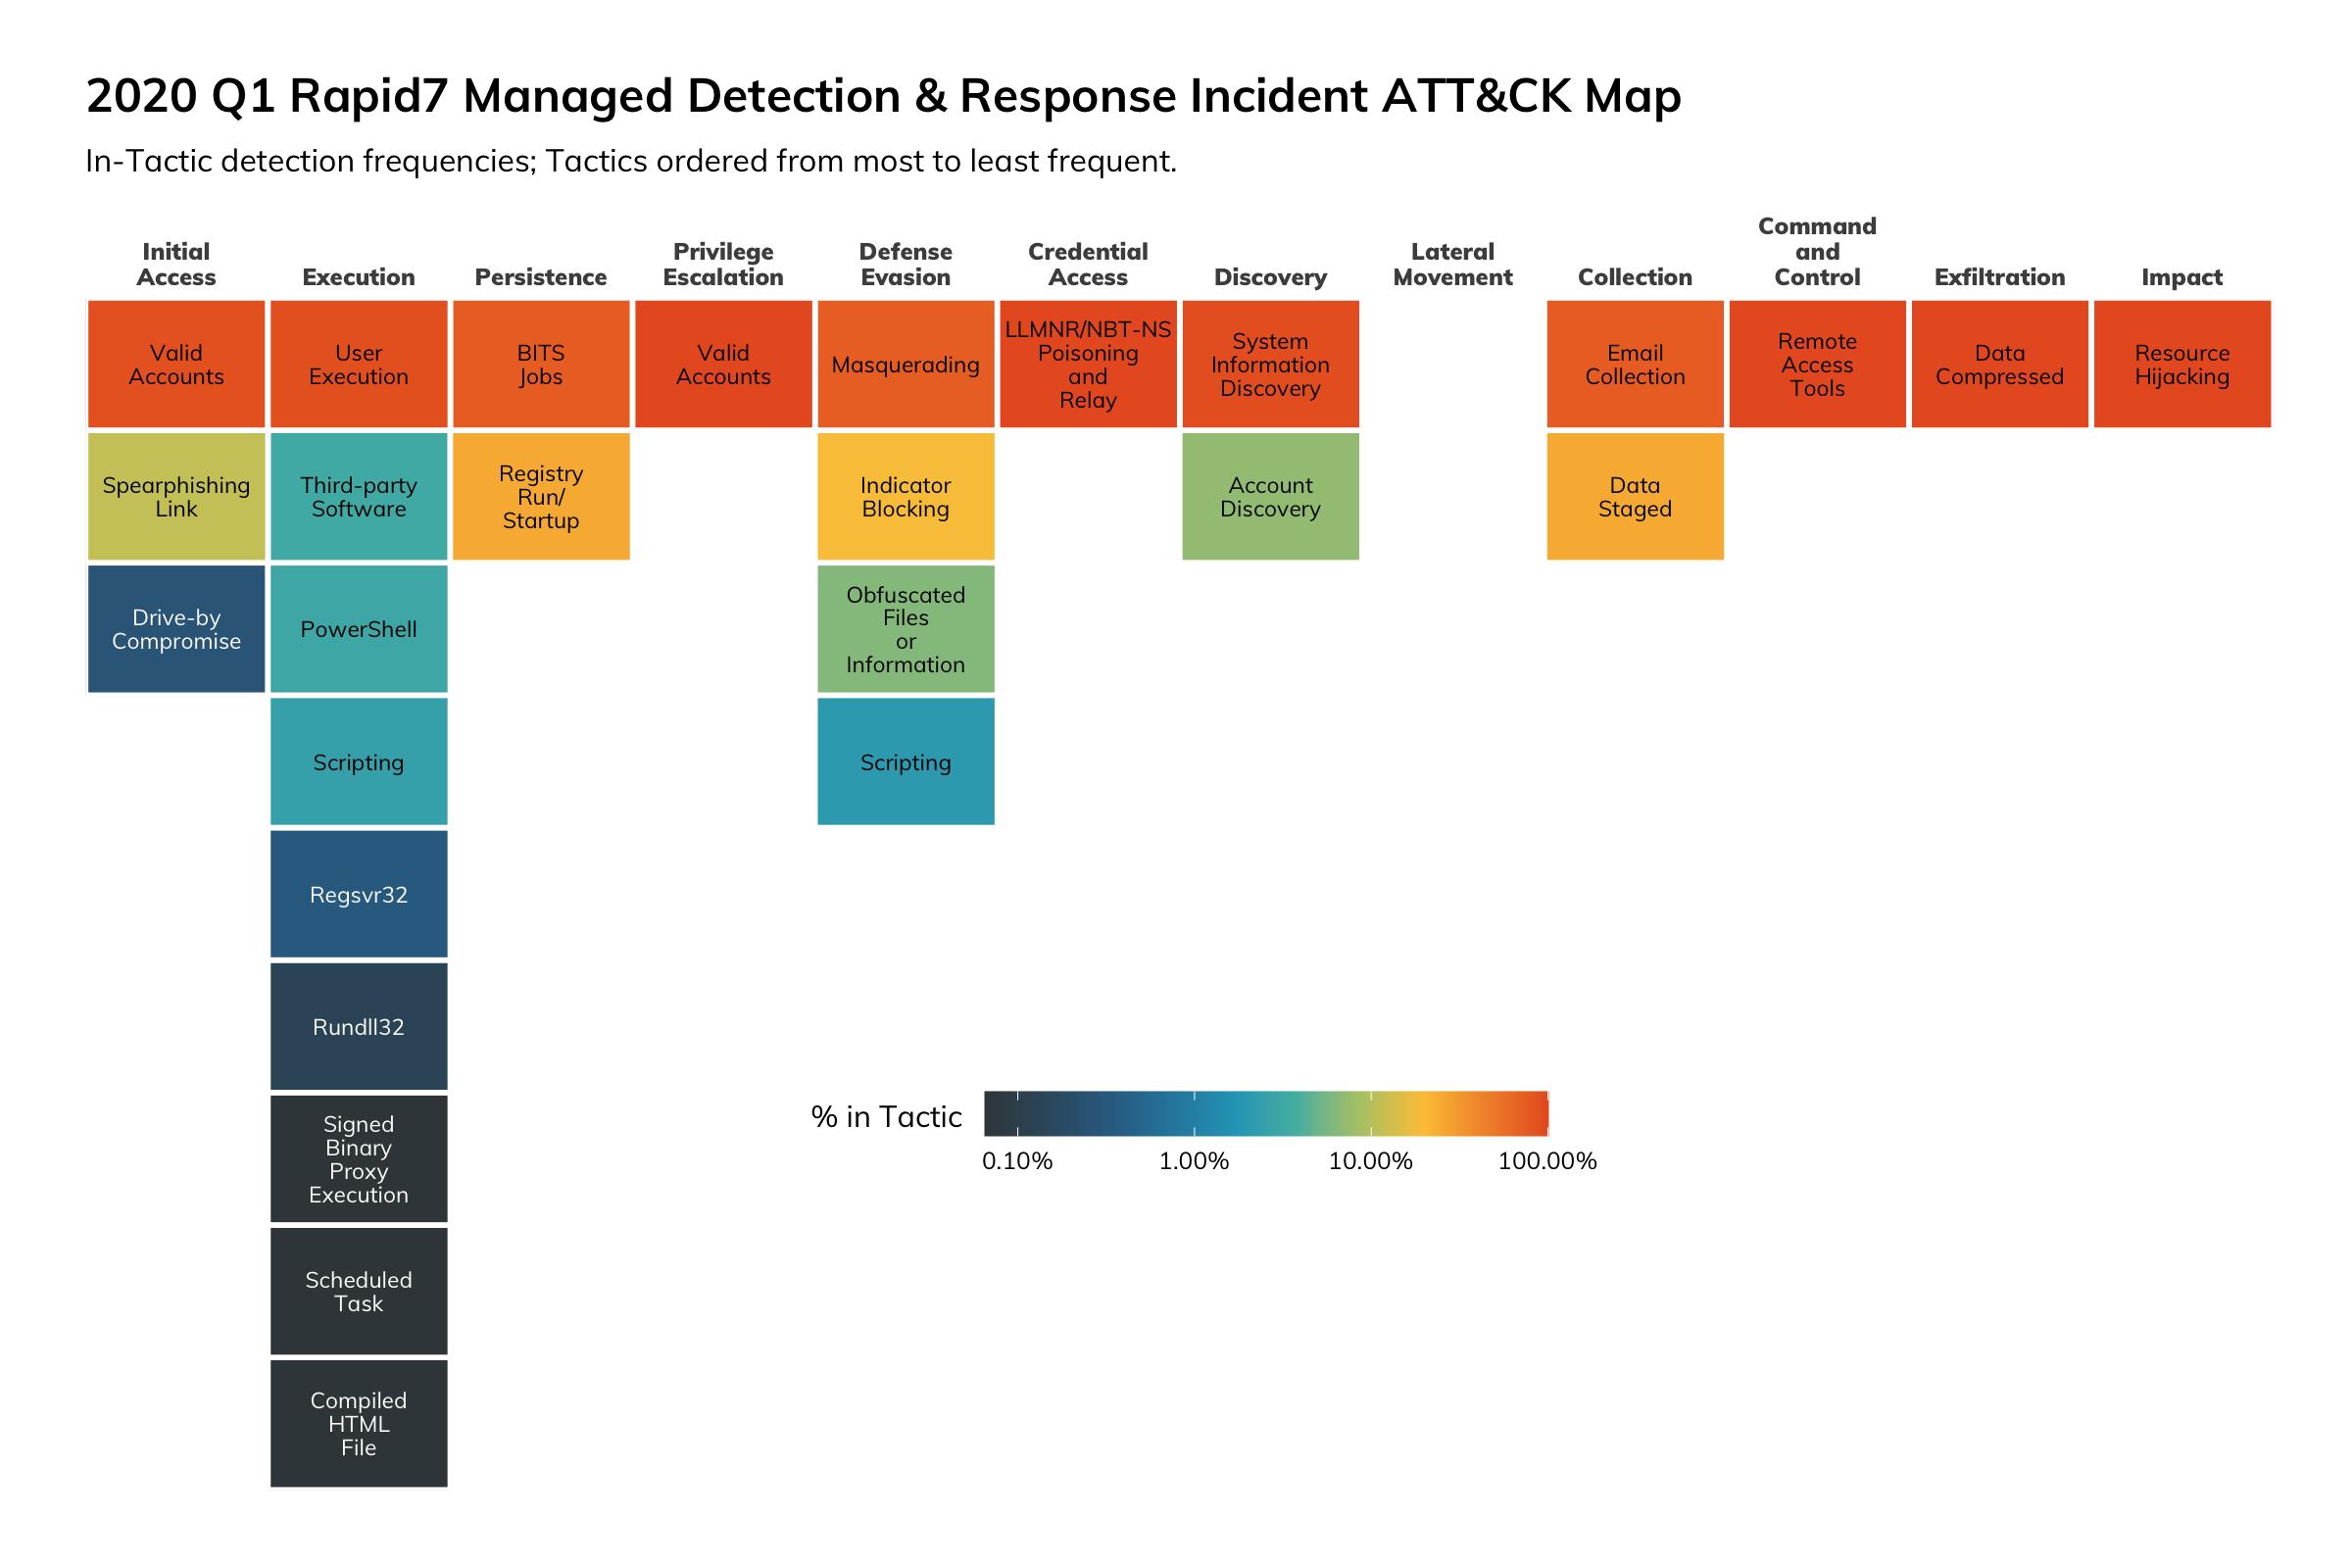 Figure 8: 2020 Q1 Rapid7 Managed Detection & Response Incident ATT&CK Map